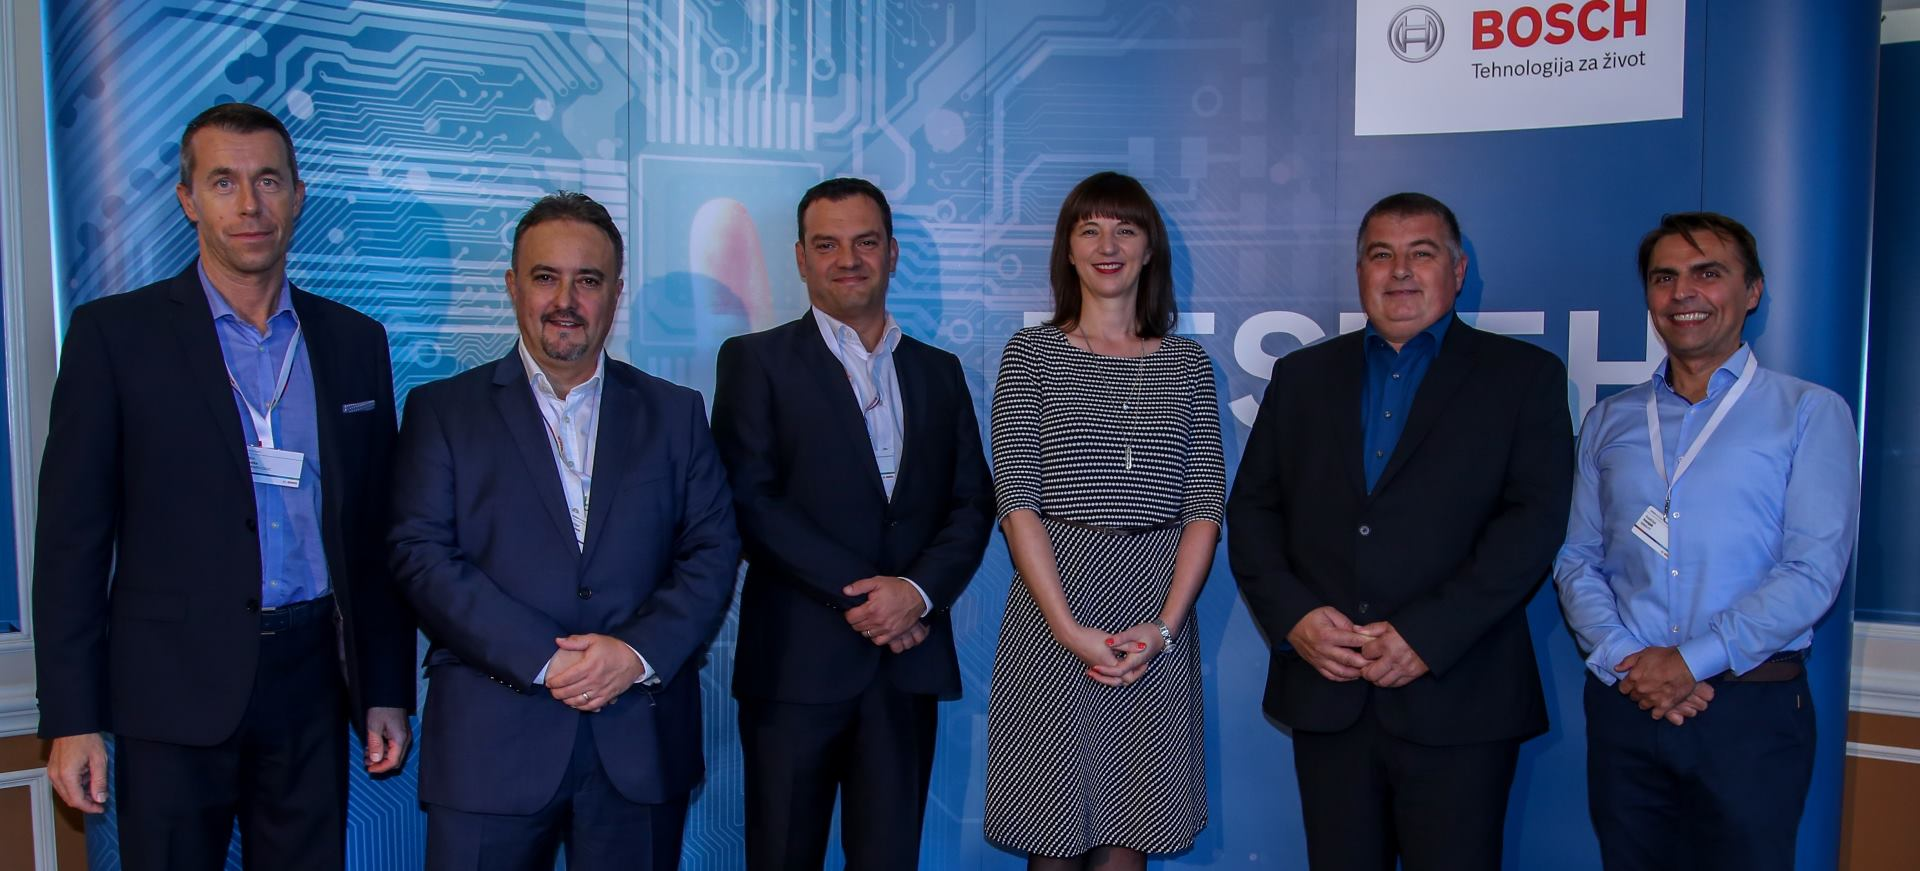 FESTEH Bosch Hrvatska organizao prvi festival tehnologije u Jastrebarskom